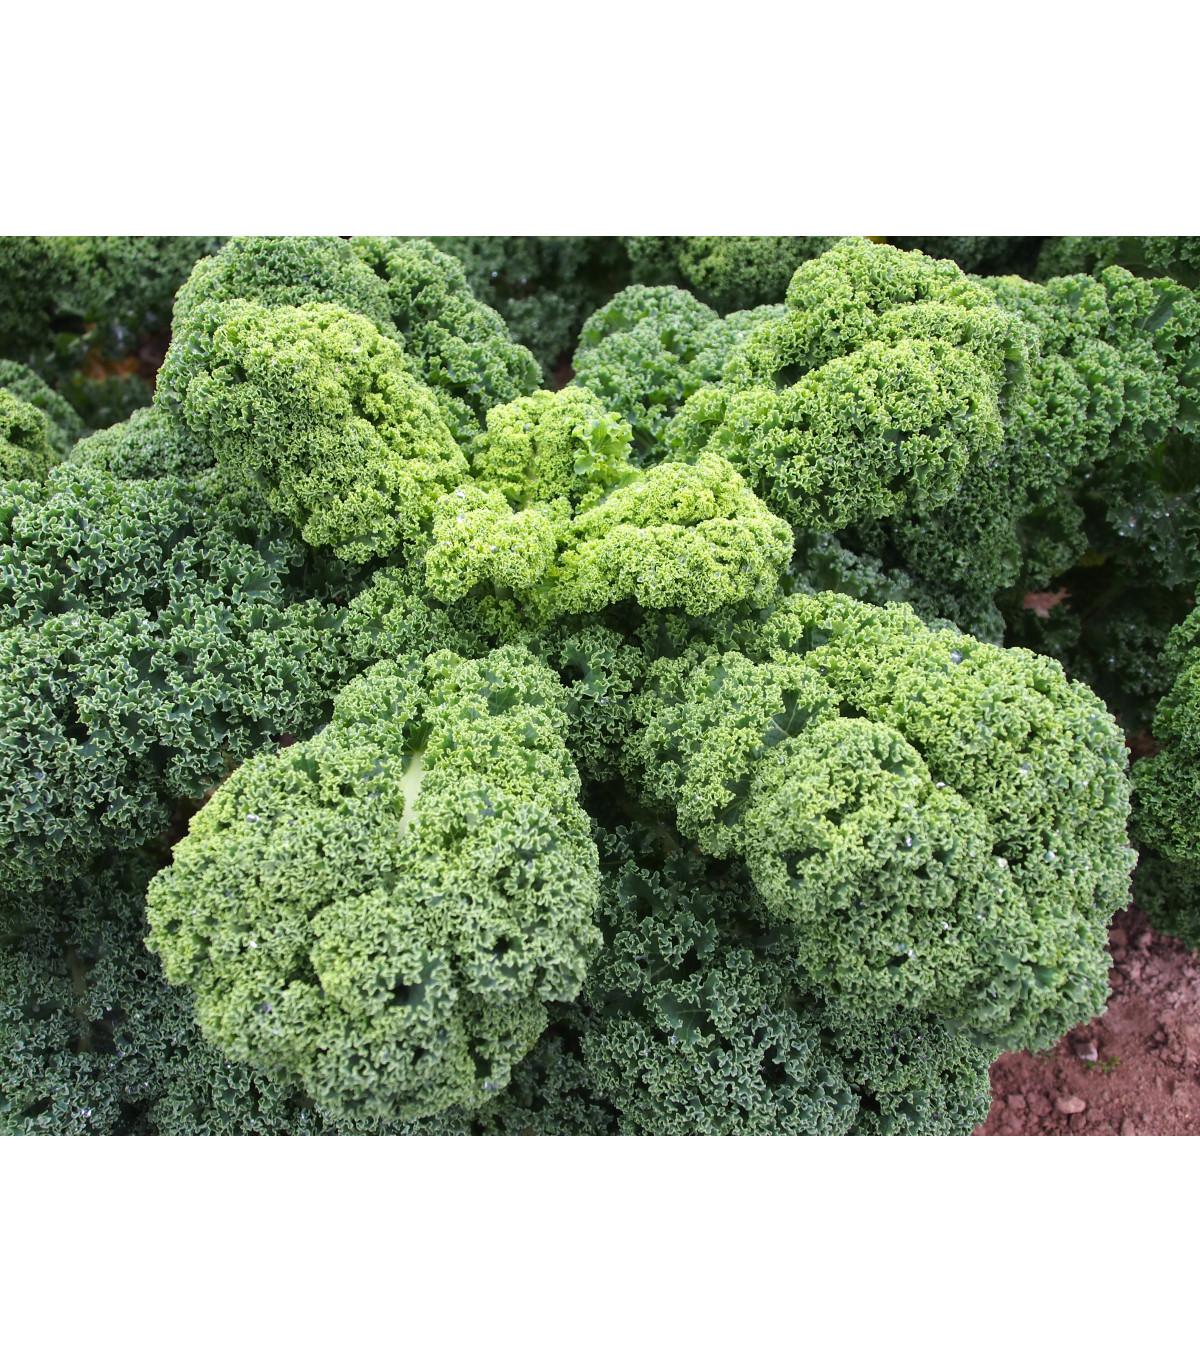 Kadeřávek Husar - Brassica oleracea L. - semena kadeřávku - 140 ks